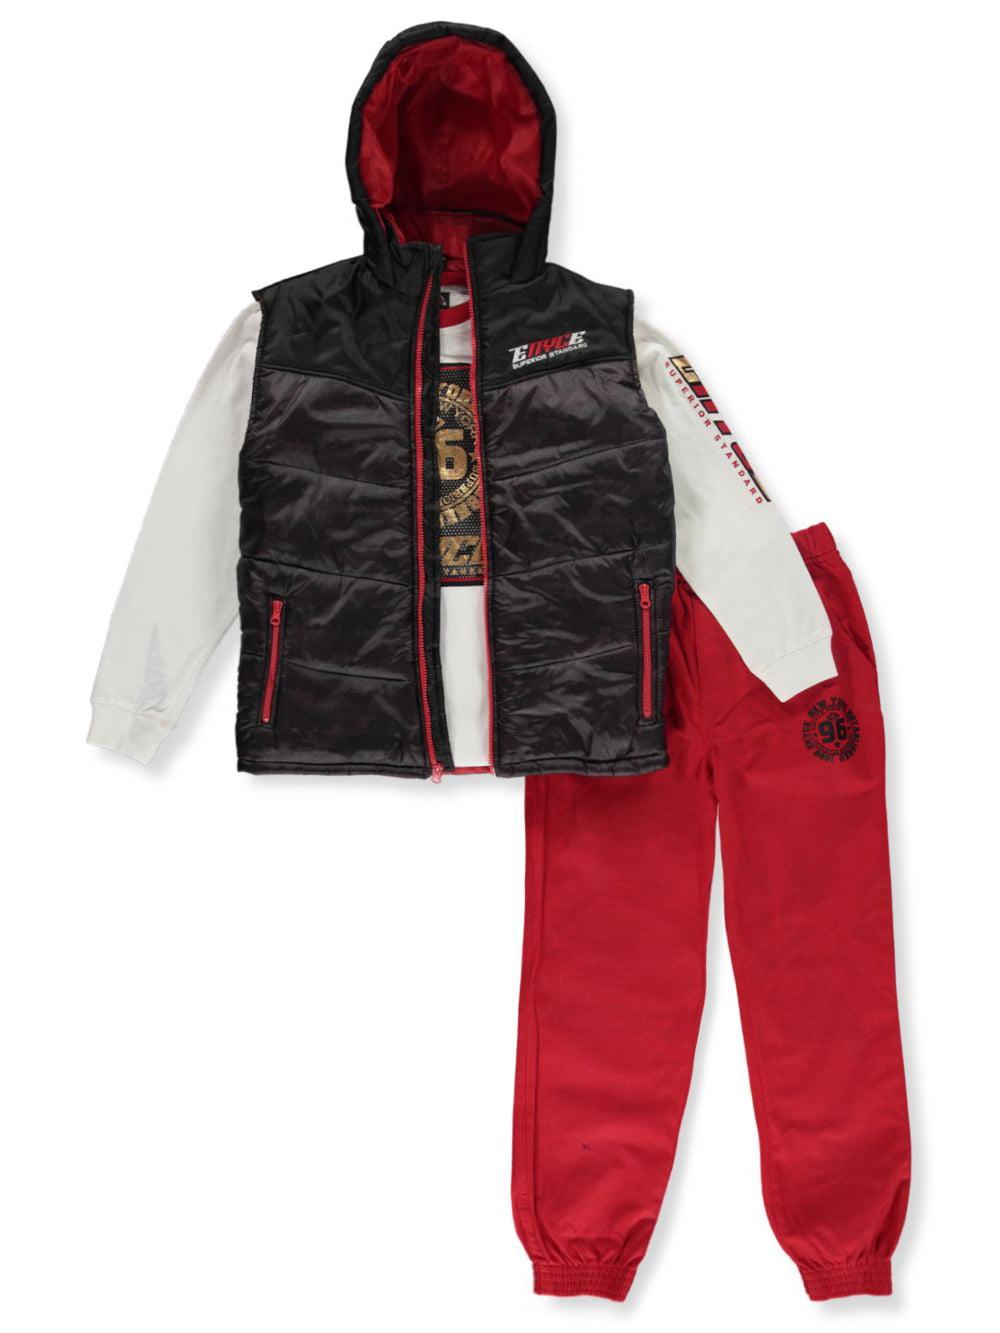 Enyce Boys/' Camo Vest 3-Piece Joggers Set Outfit